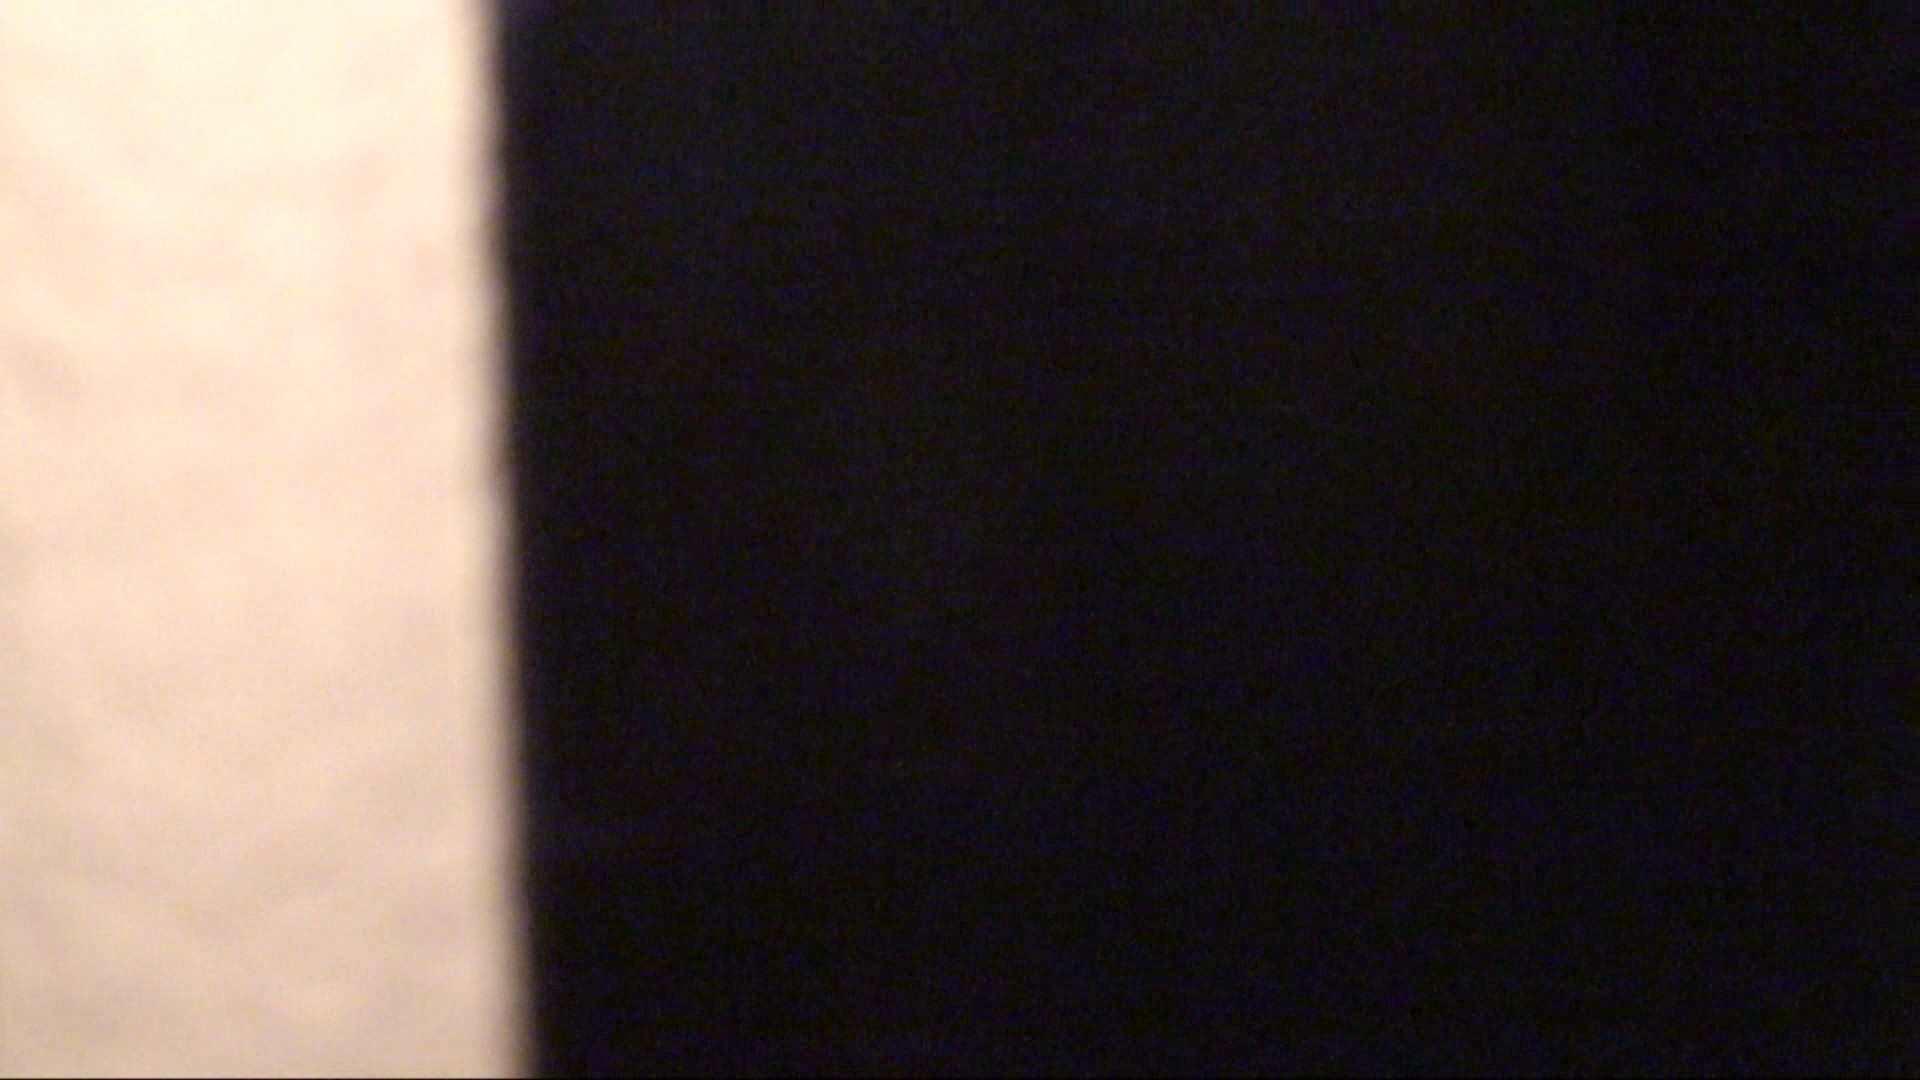 vol.01必見!白肌嬢の乳首が丸見え。極上美人のすっぴん顔をハイビジョンで! 乳首 オメコ動画キャプチャ 89pic 25